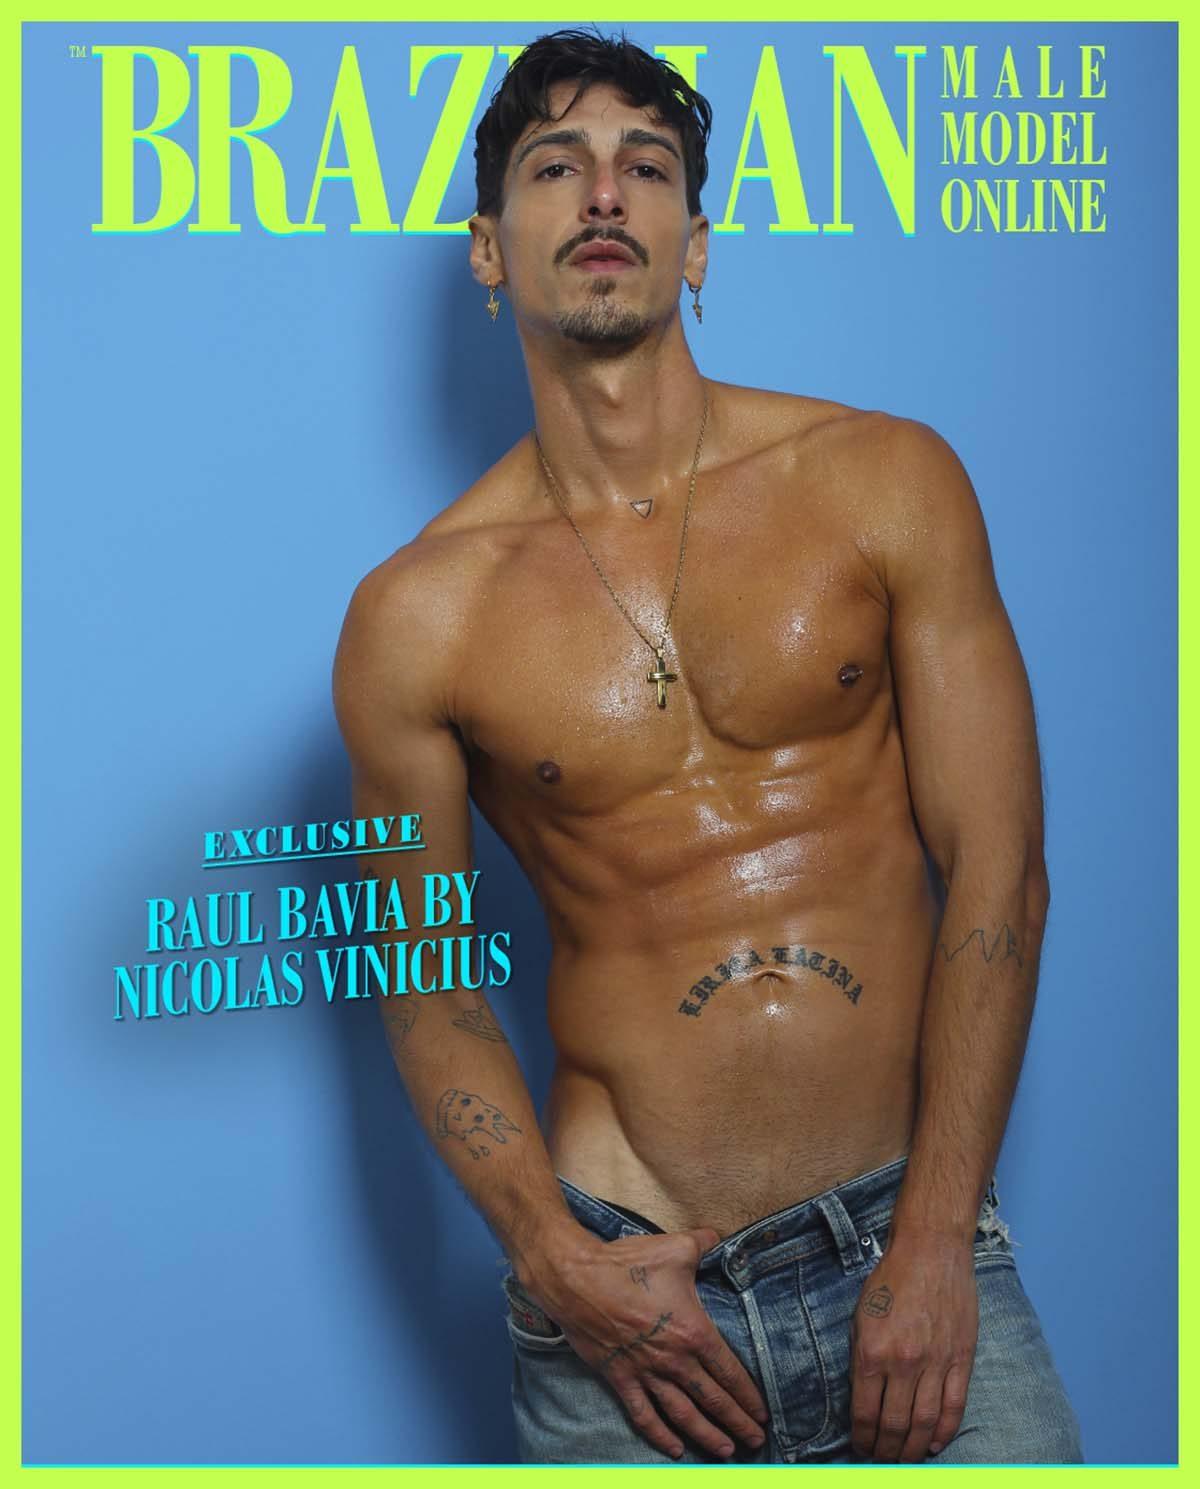 Raul Bavia by Nicolas Vinicius